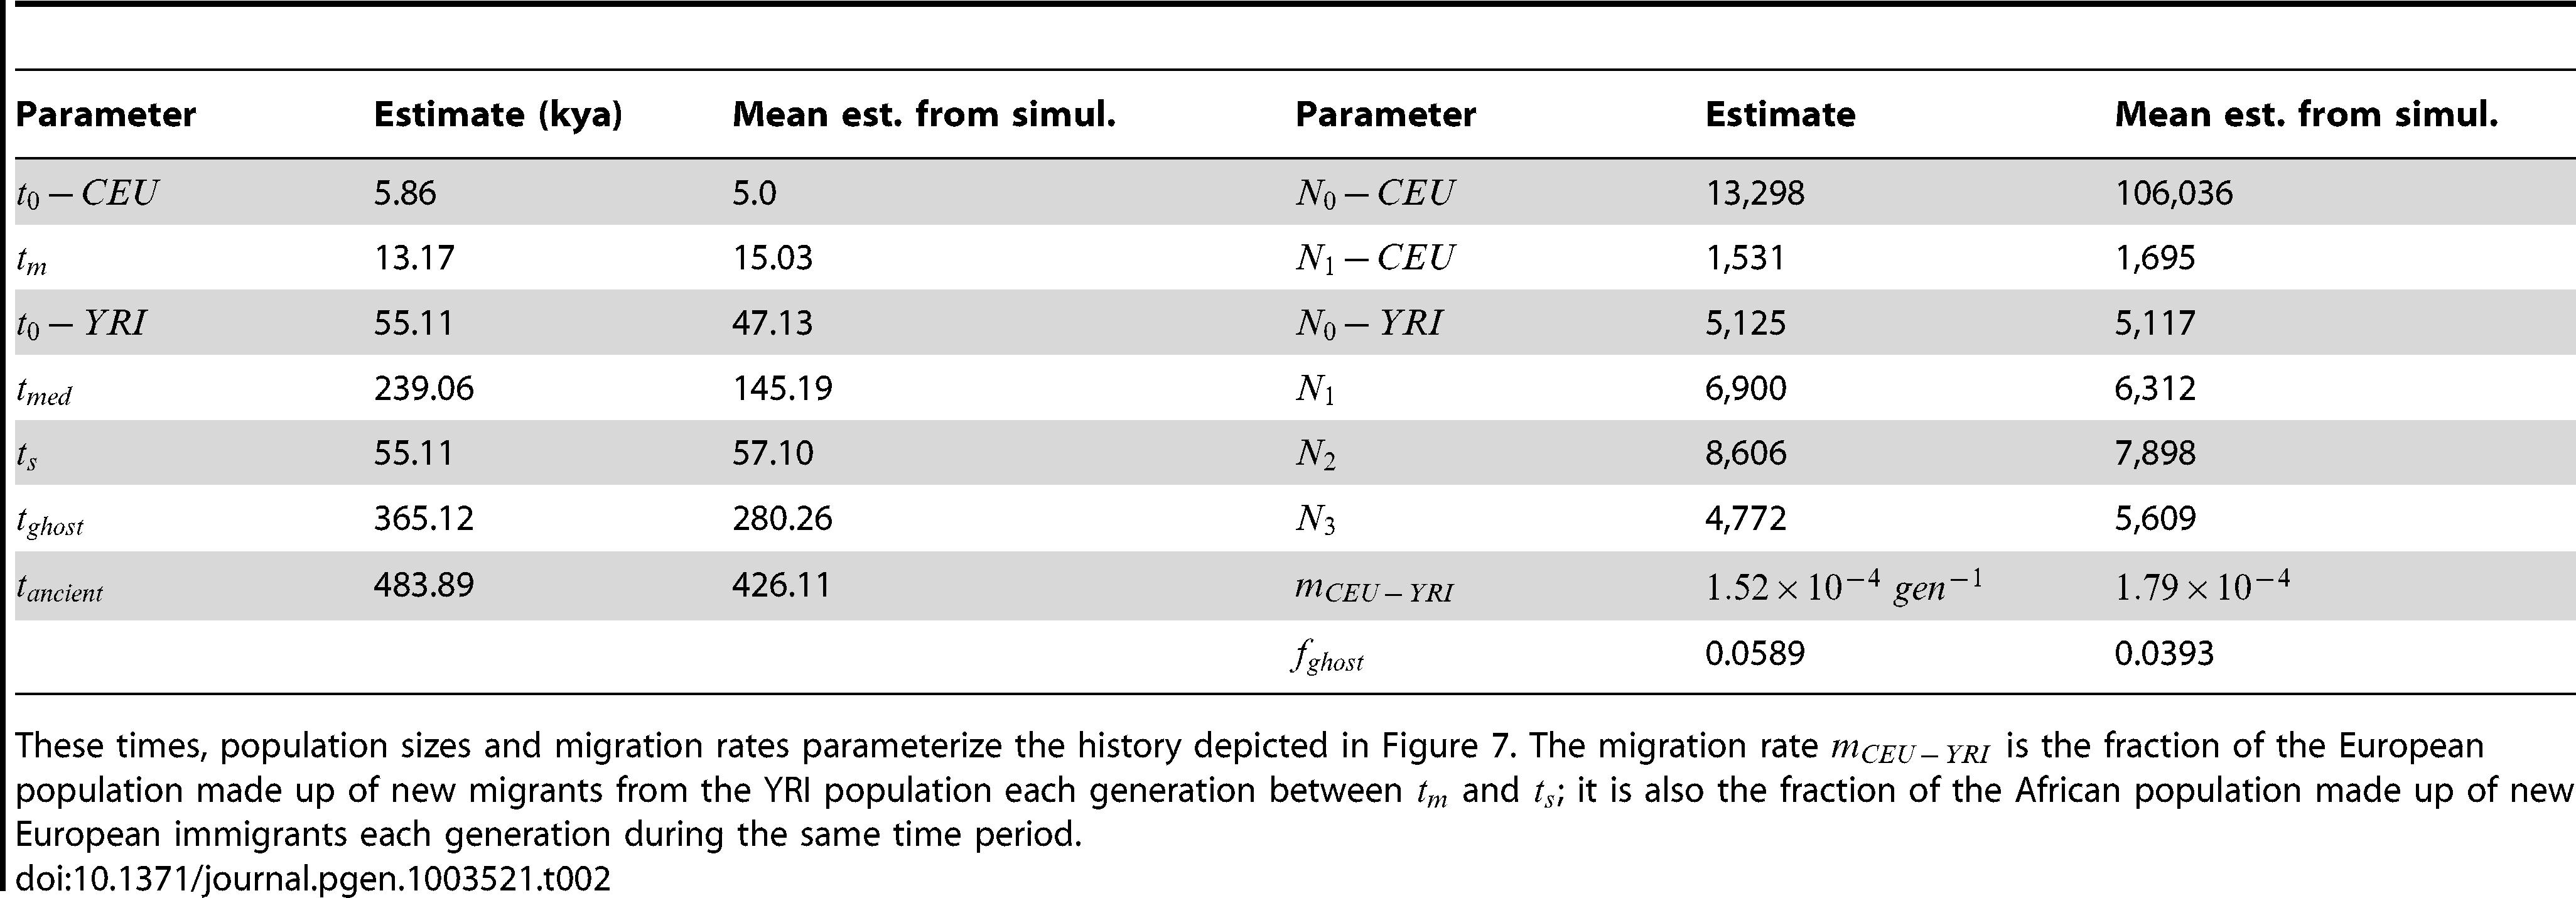 Demographic parameters estimated from trio data.